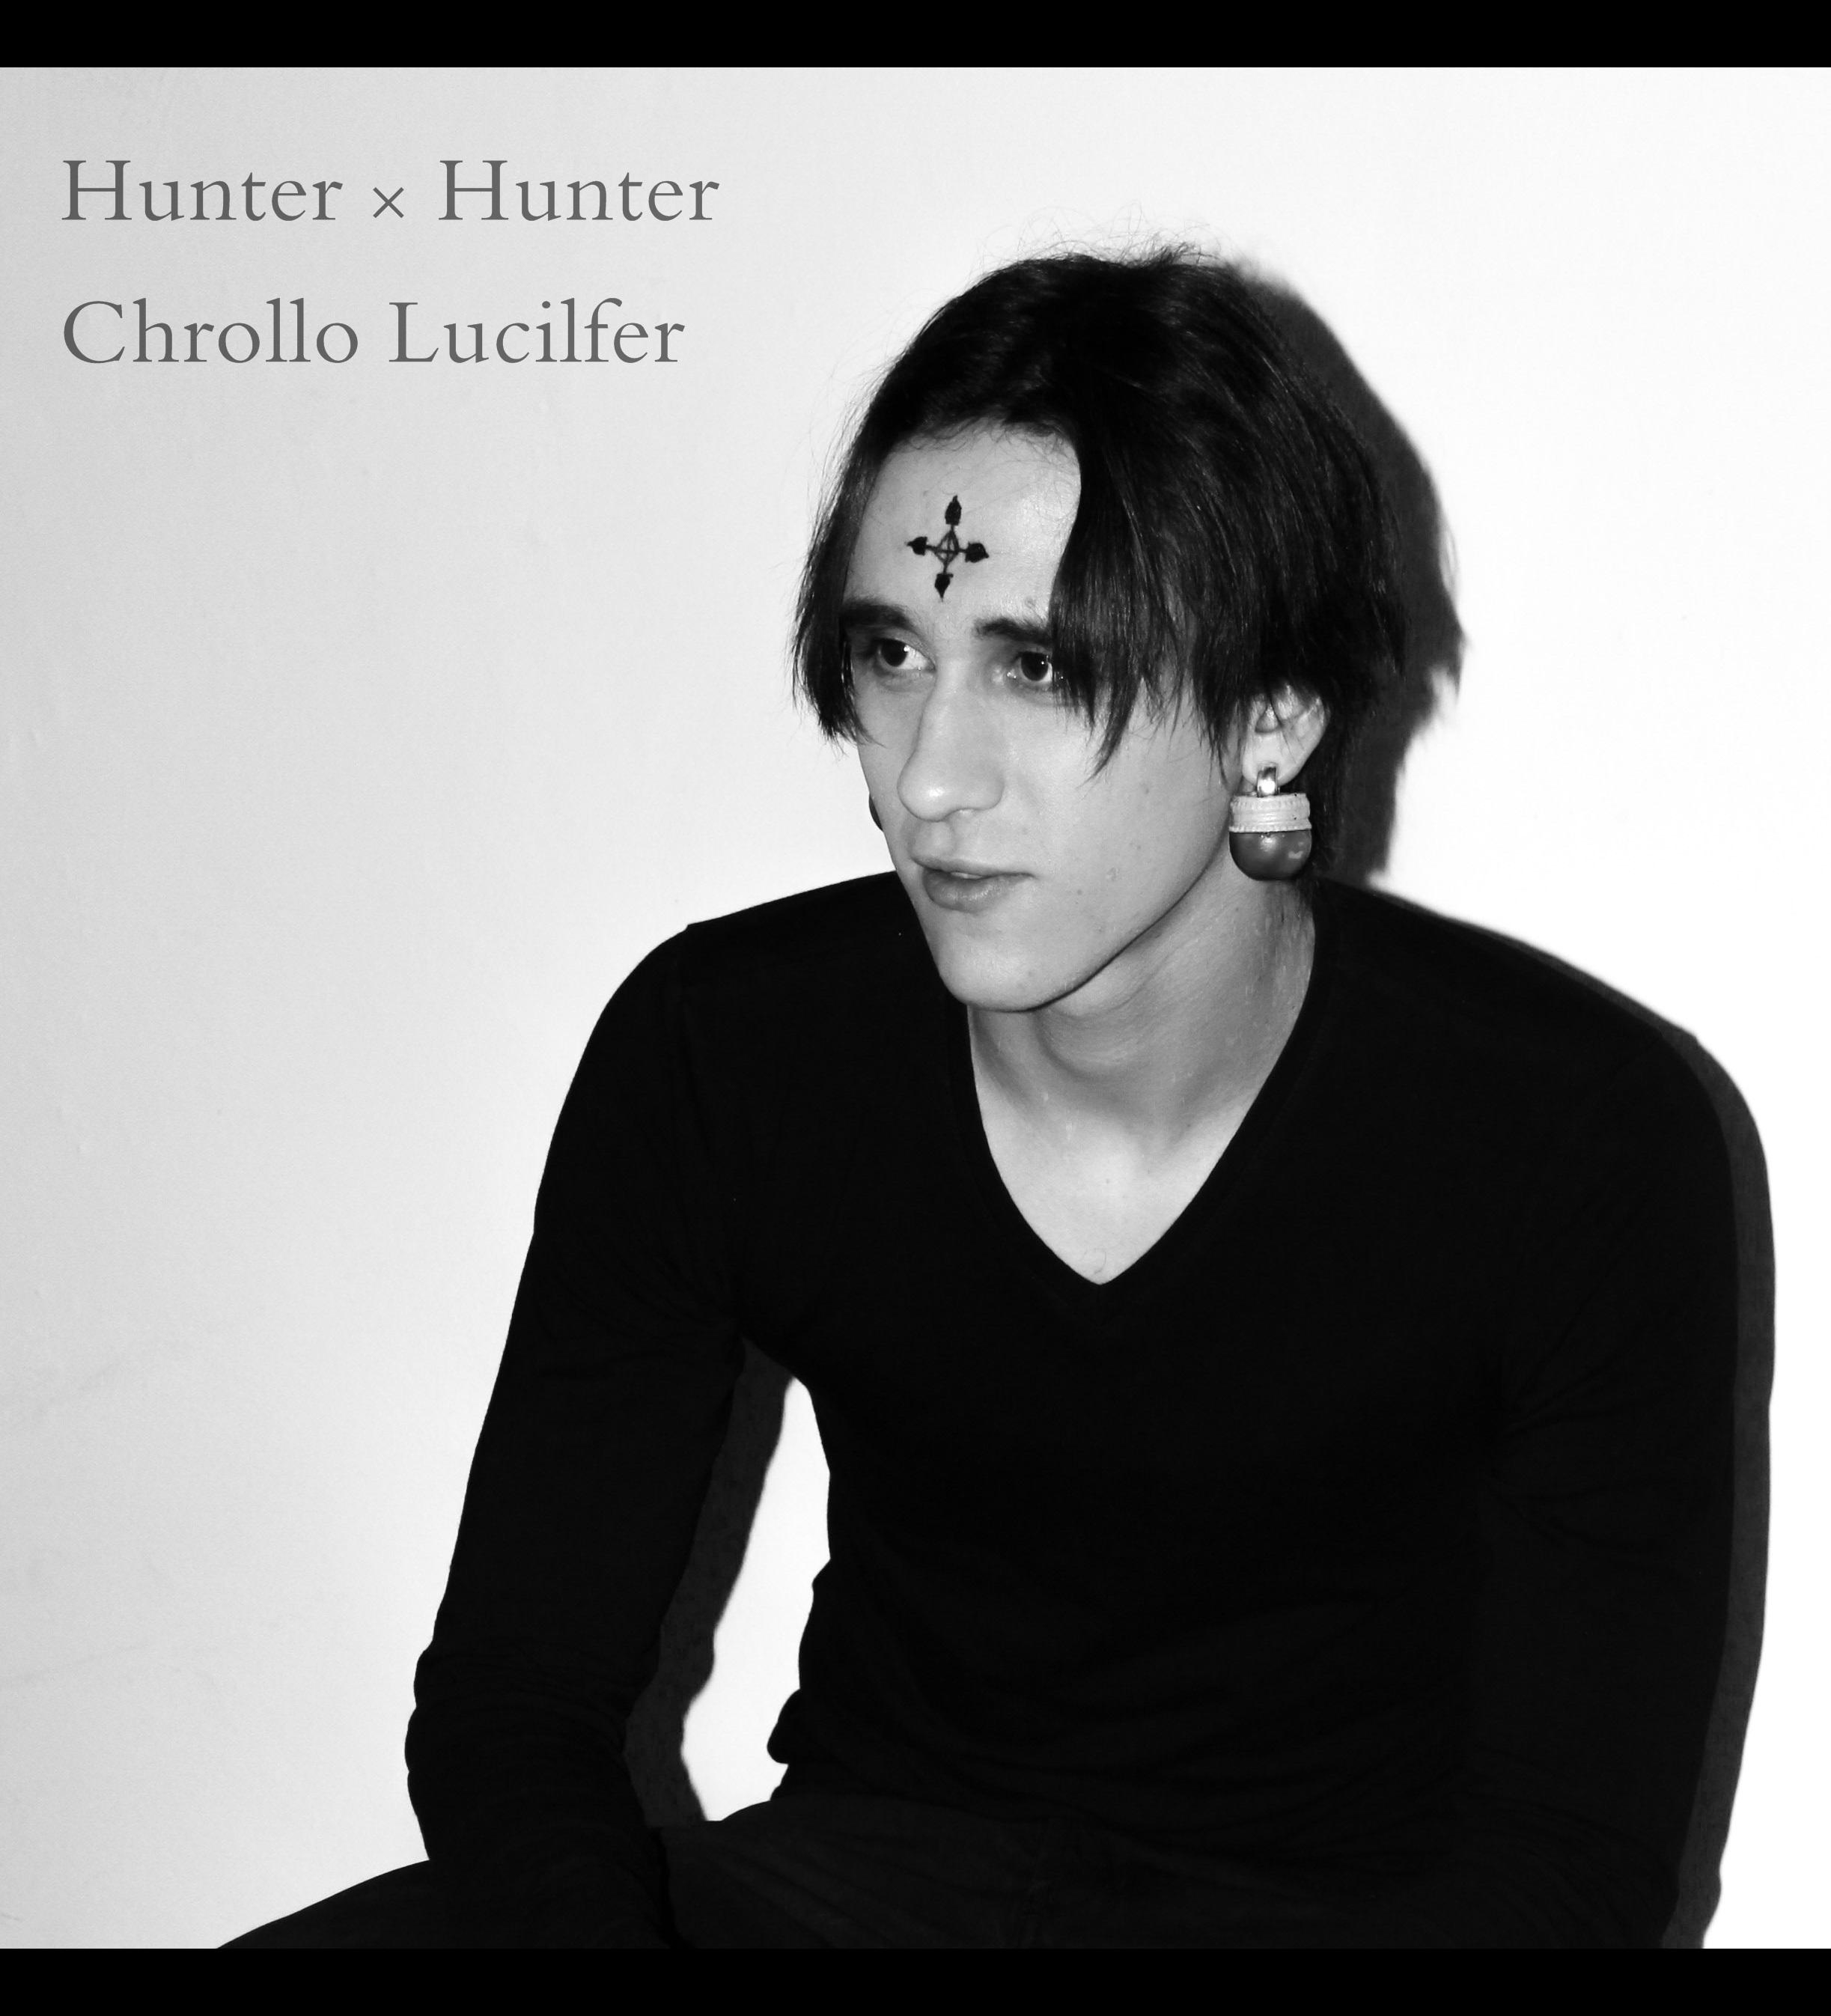 Kuroro Lucifer Hunter X Hunter By Dhax29 On Deviantart: Curse By Sid-Cosplay On DeviantArt